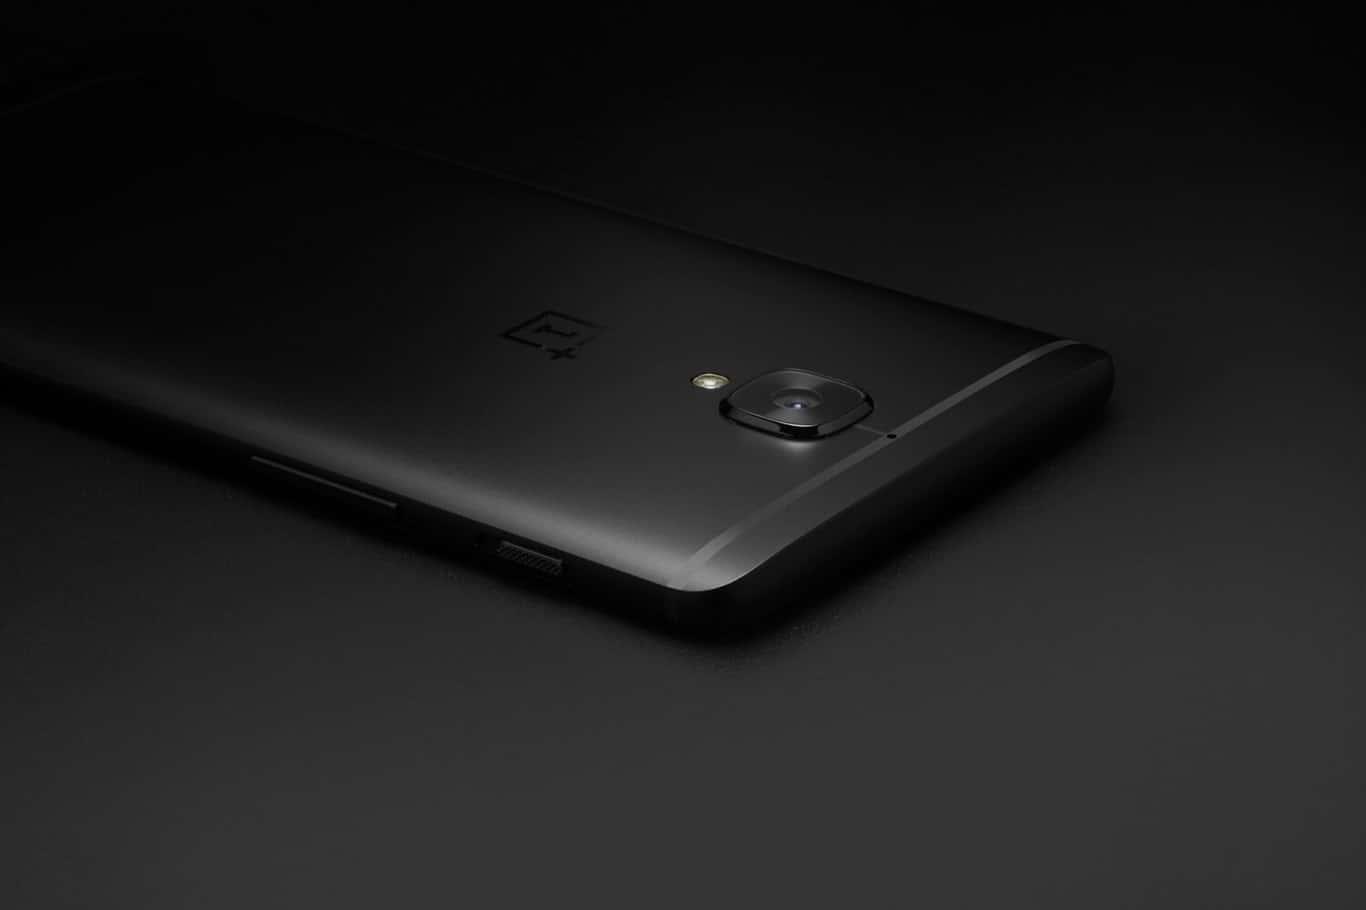 OnePlus 3T Midnight Black 3